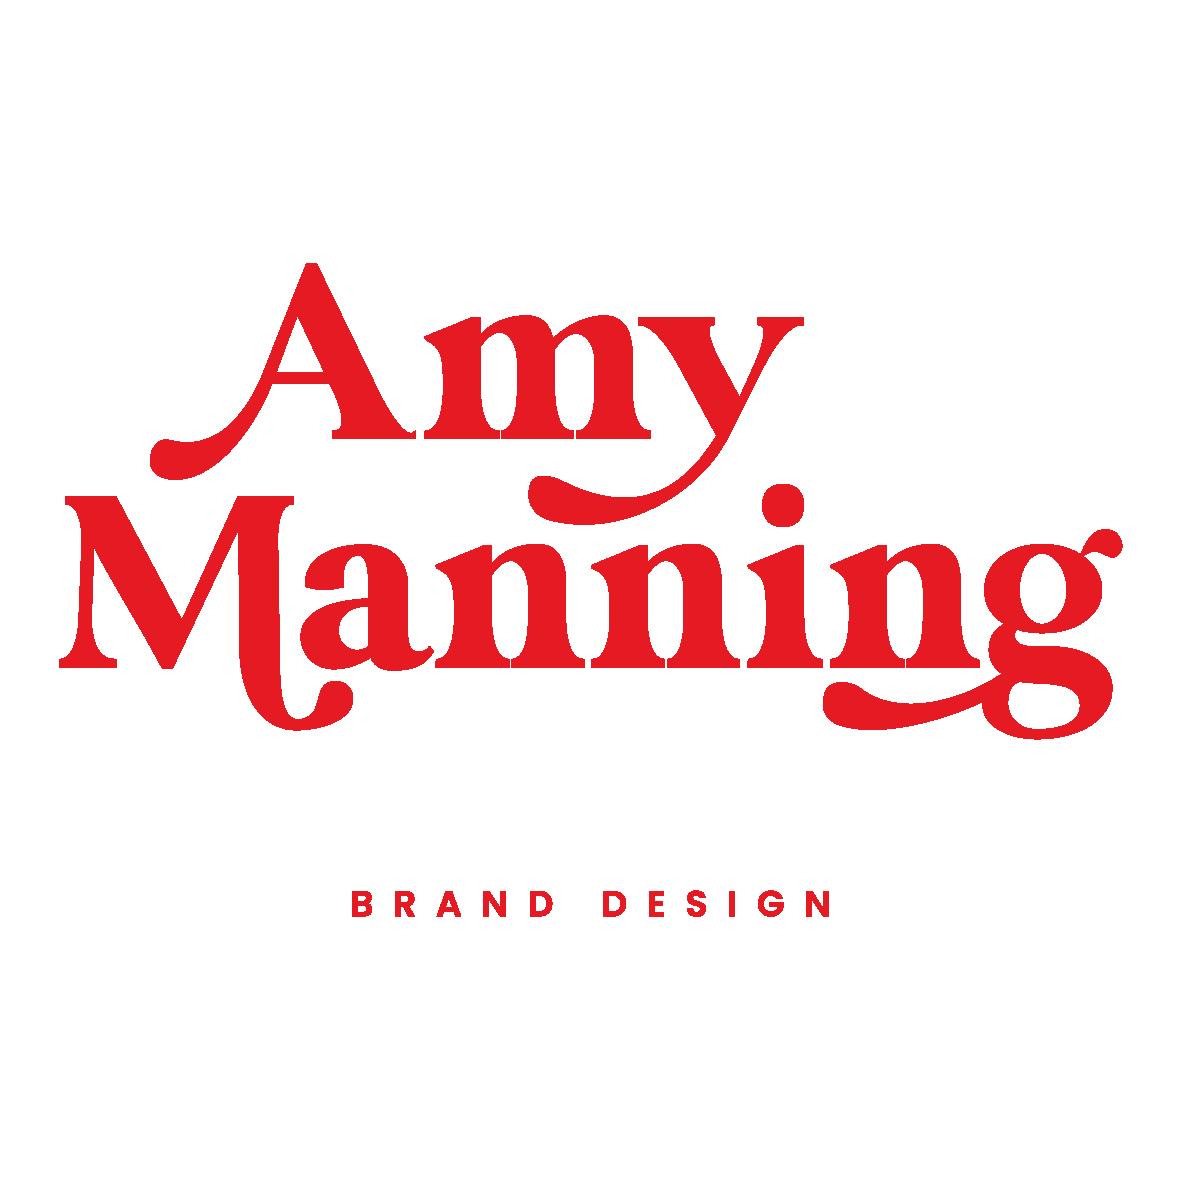 Amy Manning Brand Design